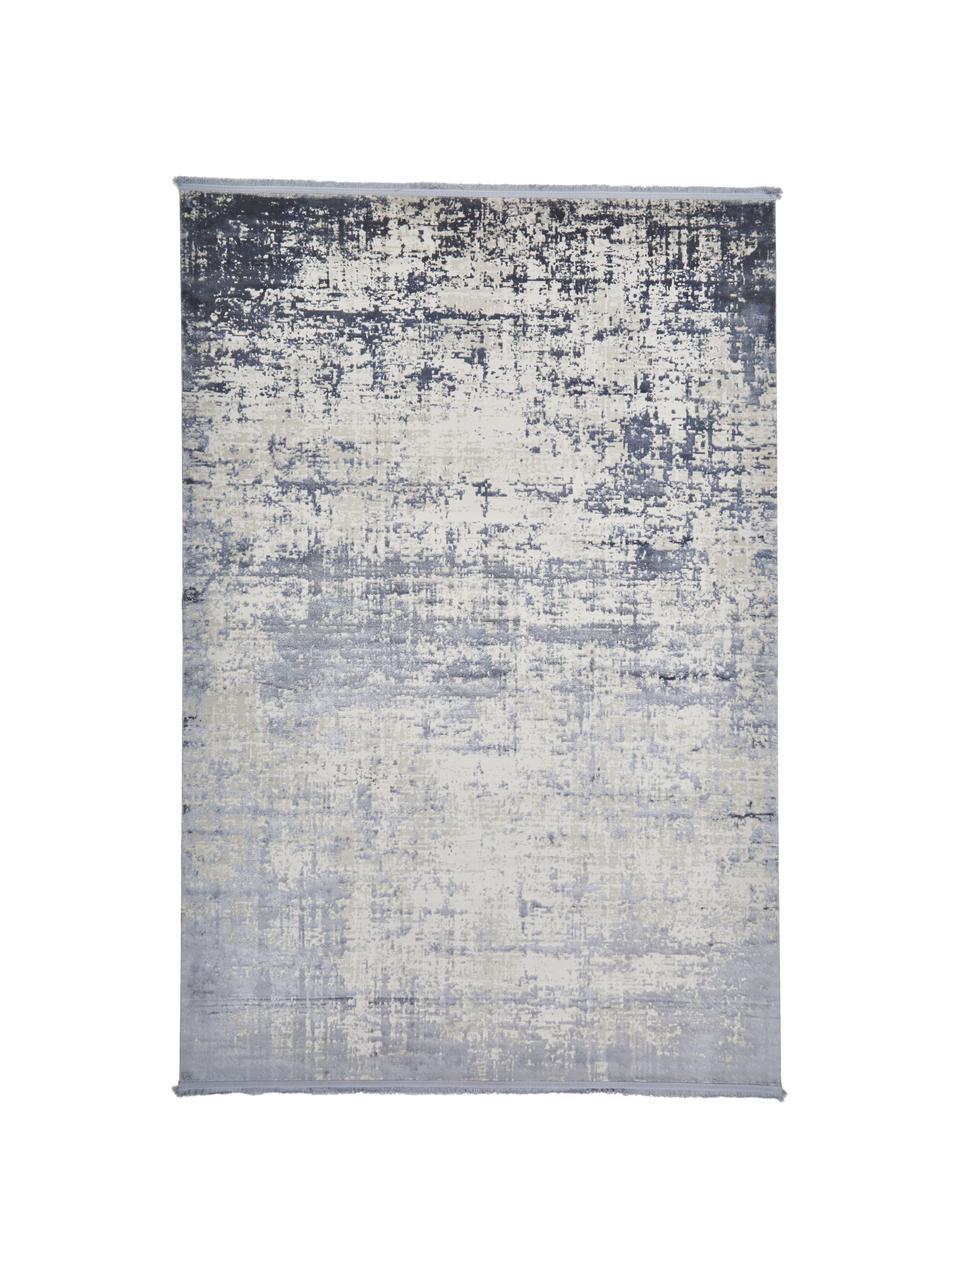 Schimmernder Teppich Cordoba mit Fransen, Vintage Style, Flor: 70% Acryl, 30% Viskose, Blau, Grau, B 130 x L 190 cm (Größe S)